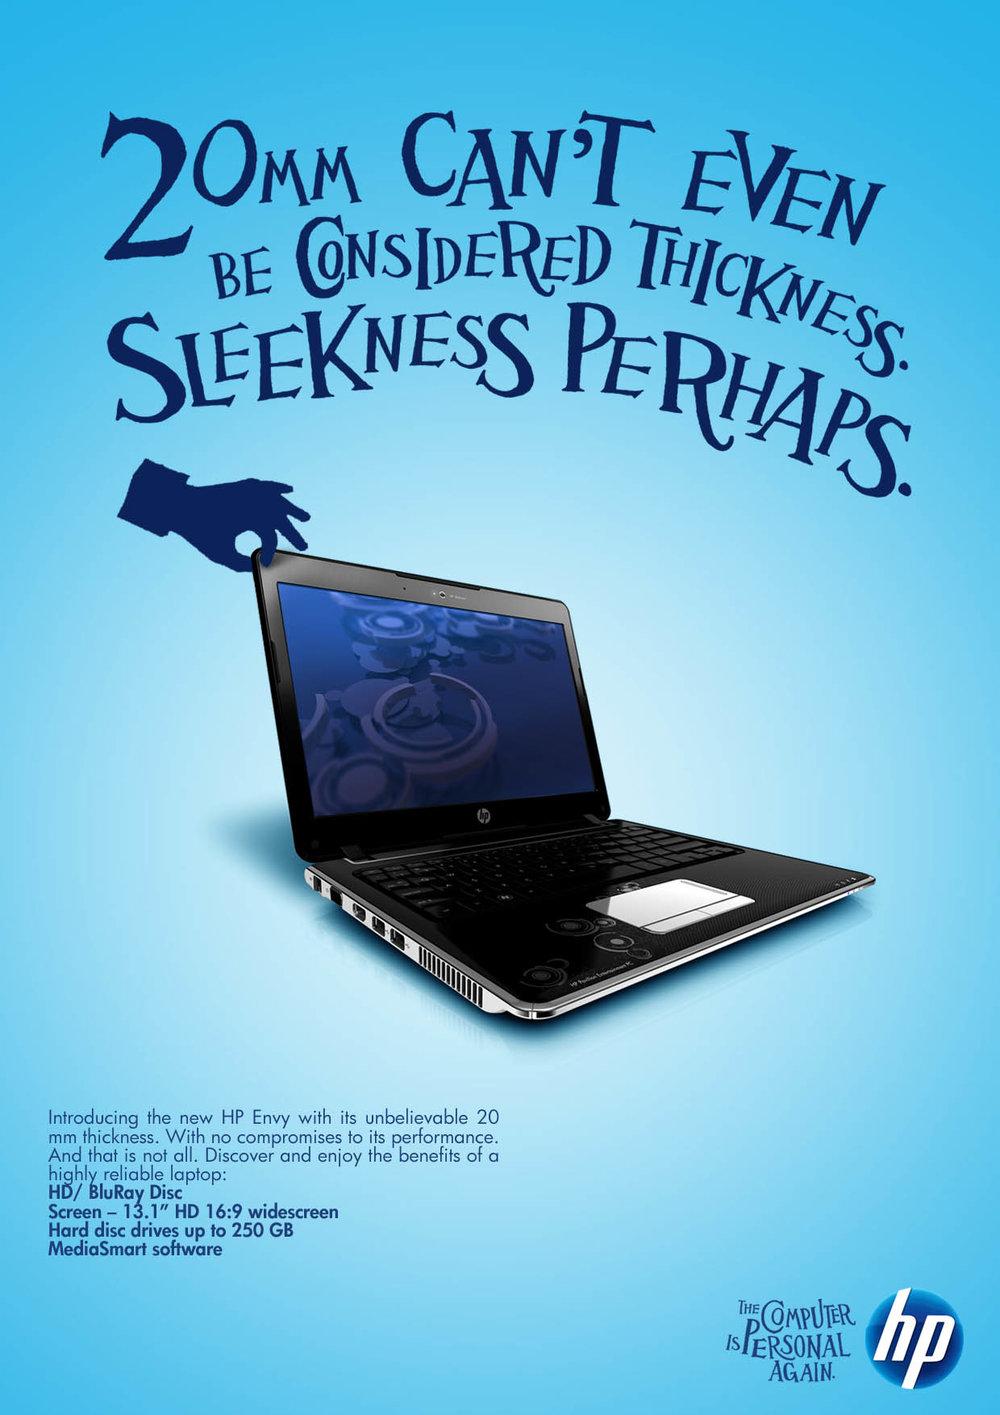 HP a.jpg